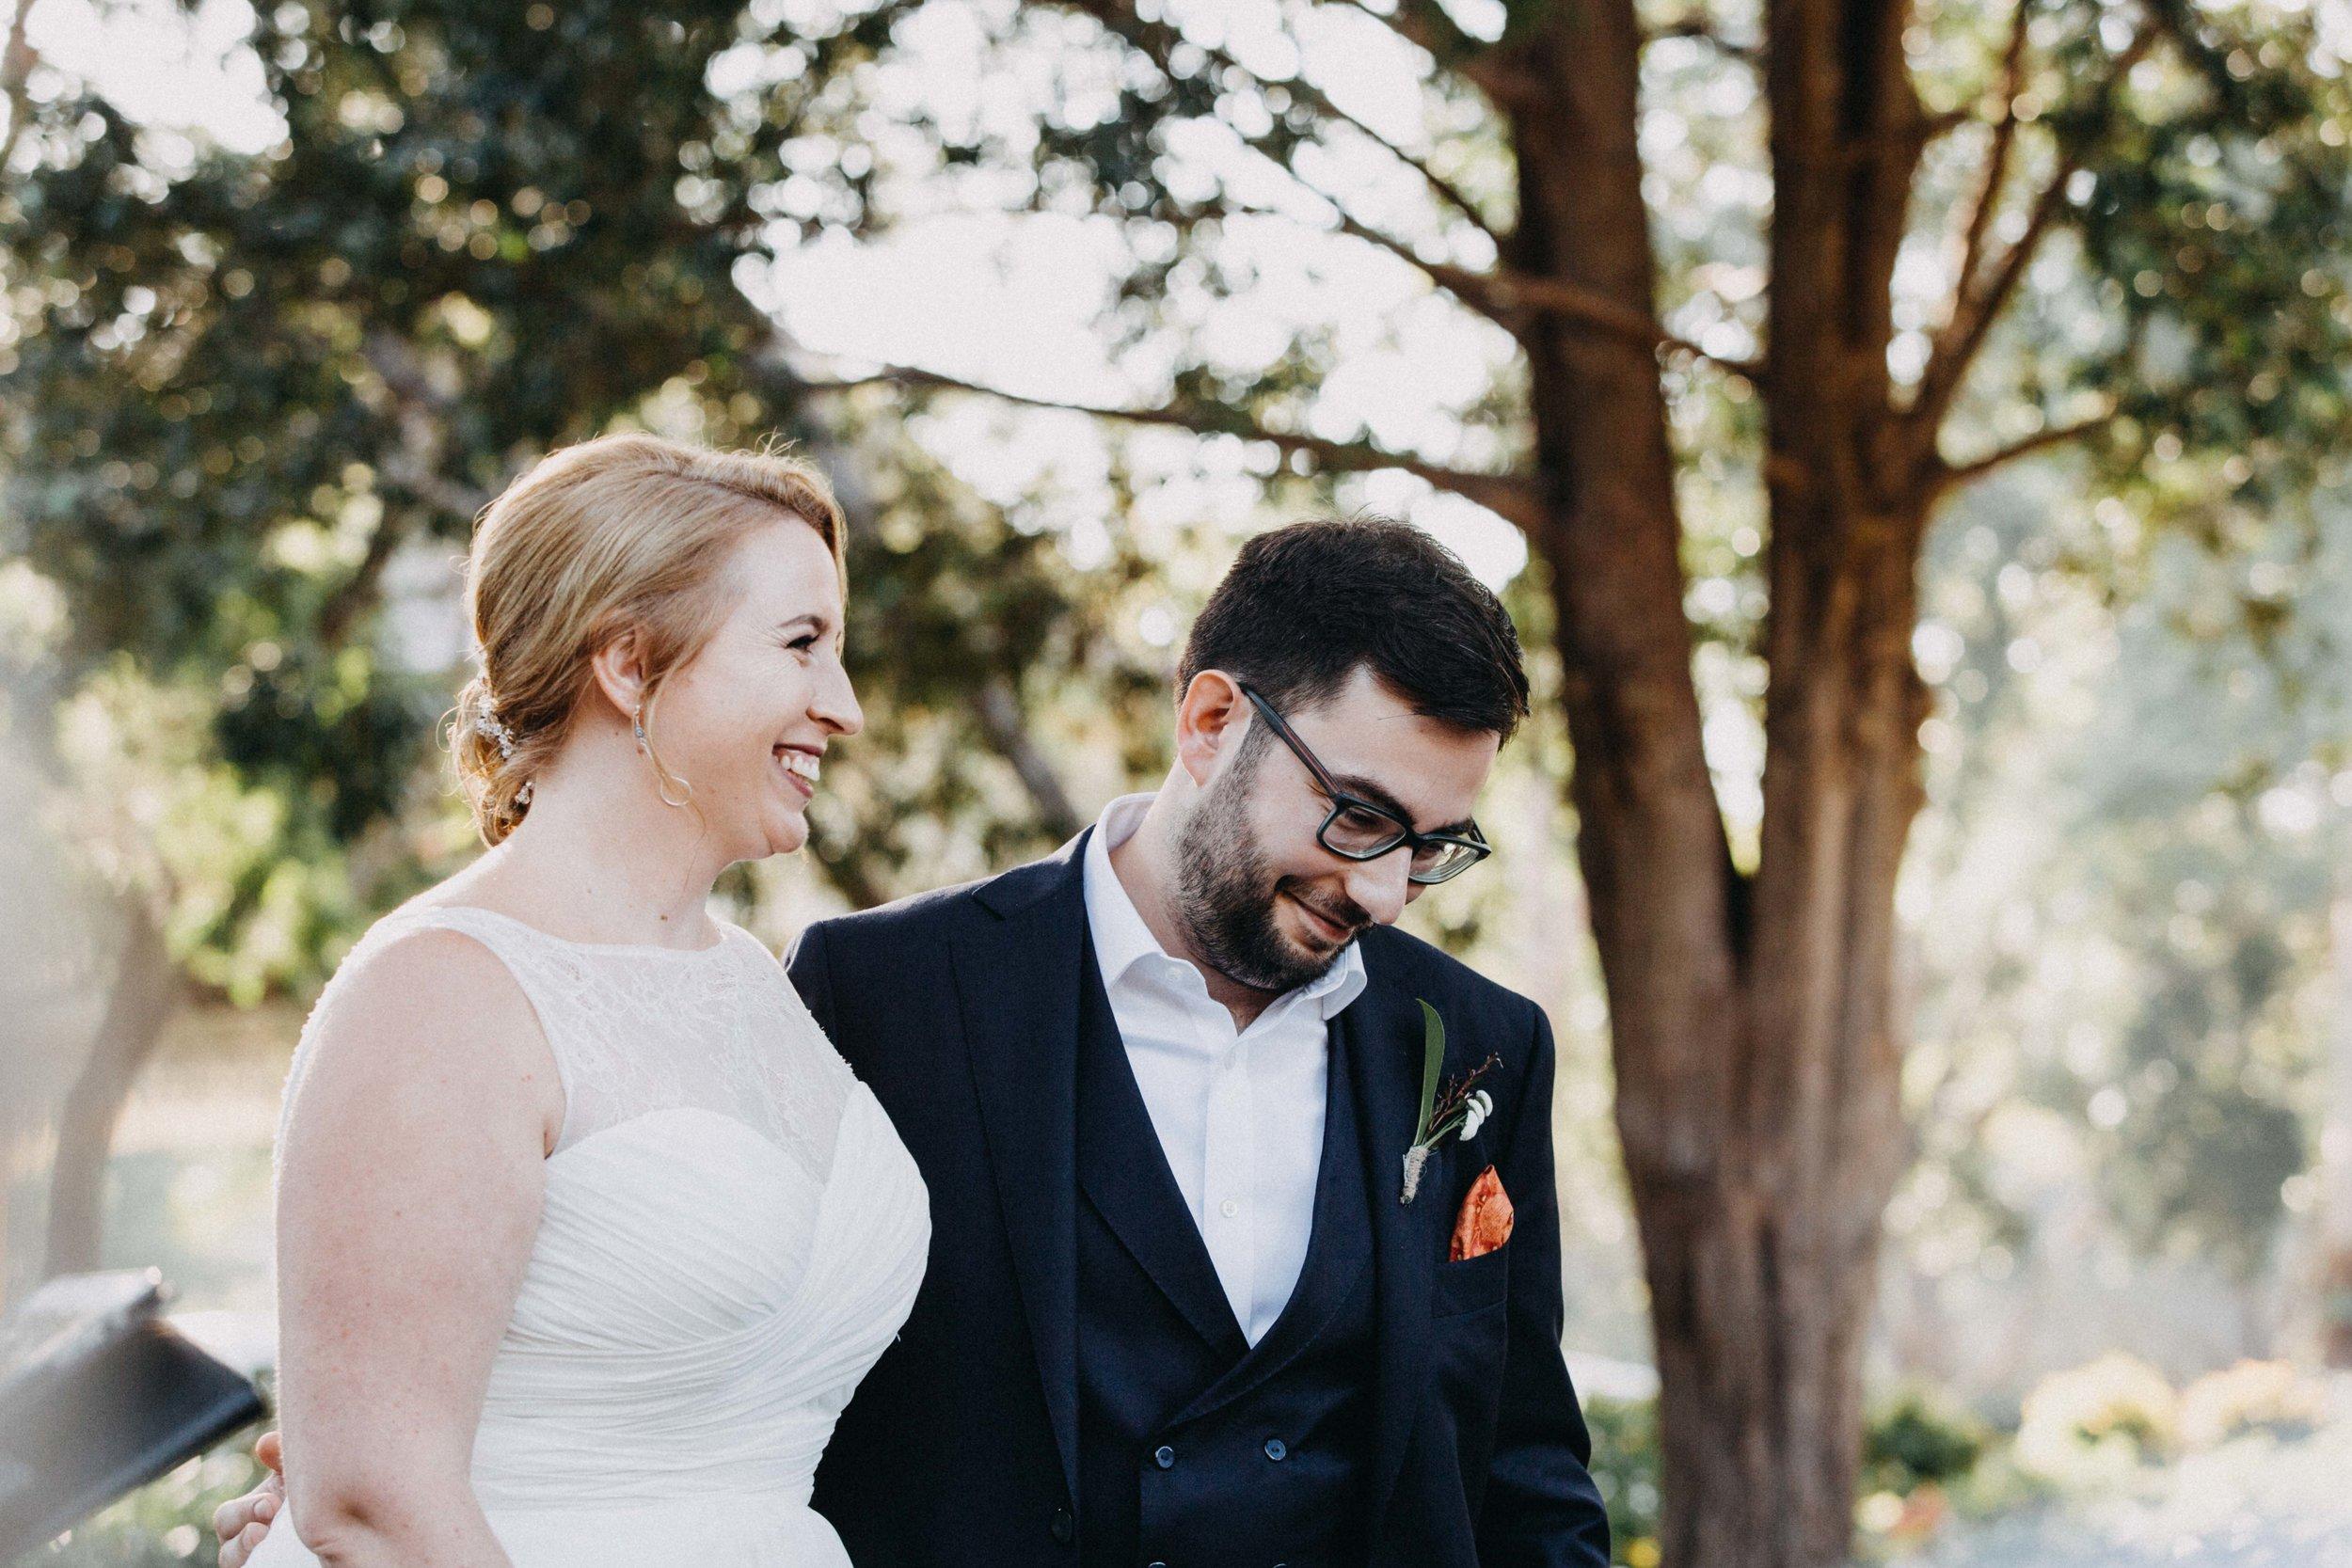 cabarita-park-sydney-wedding-emilyobrienphotography.net-19.jpg